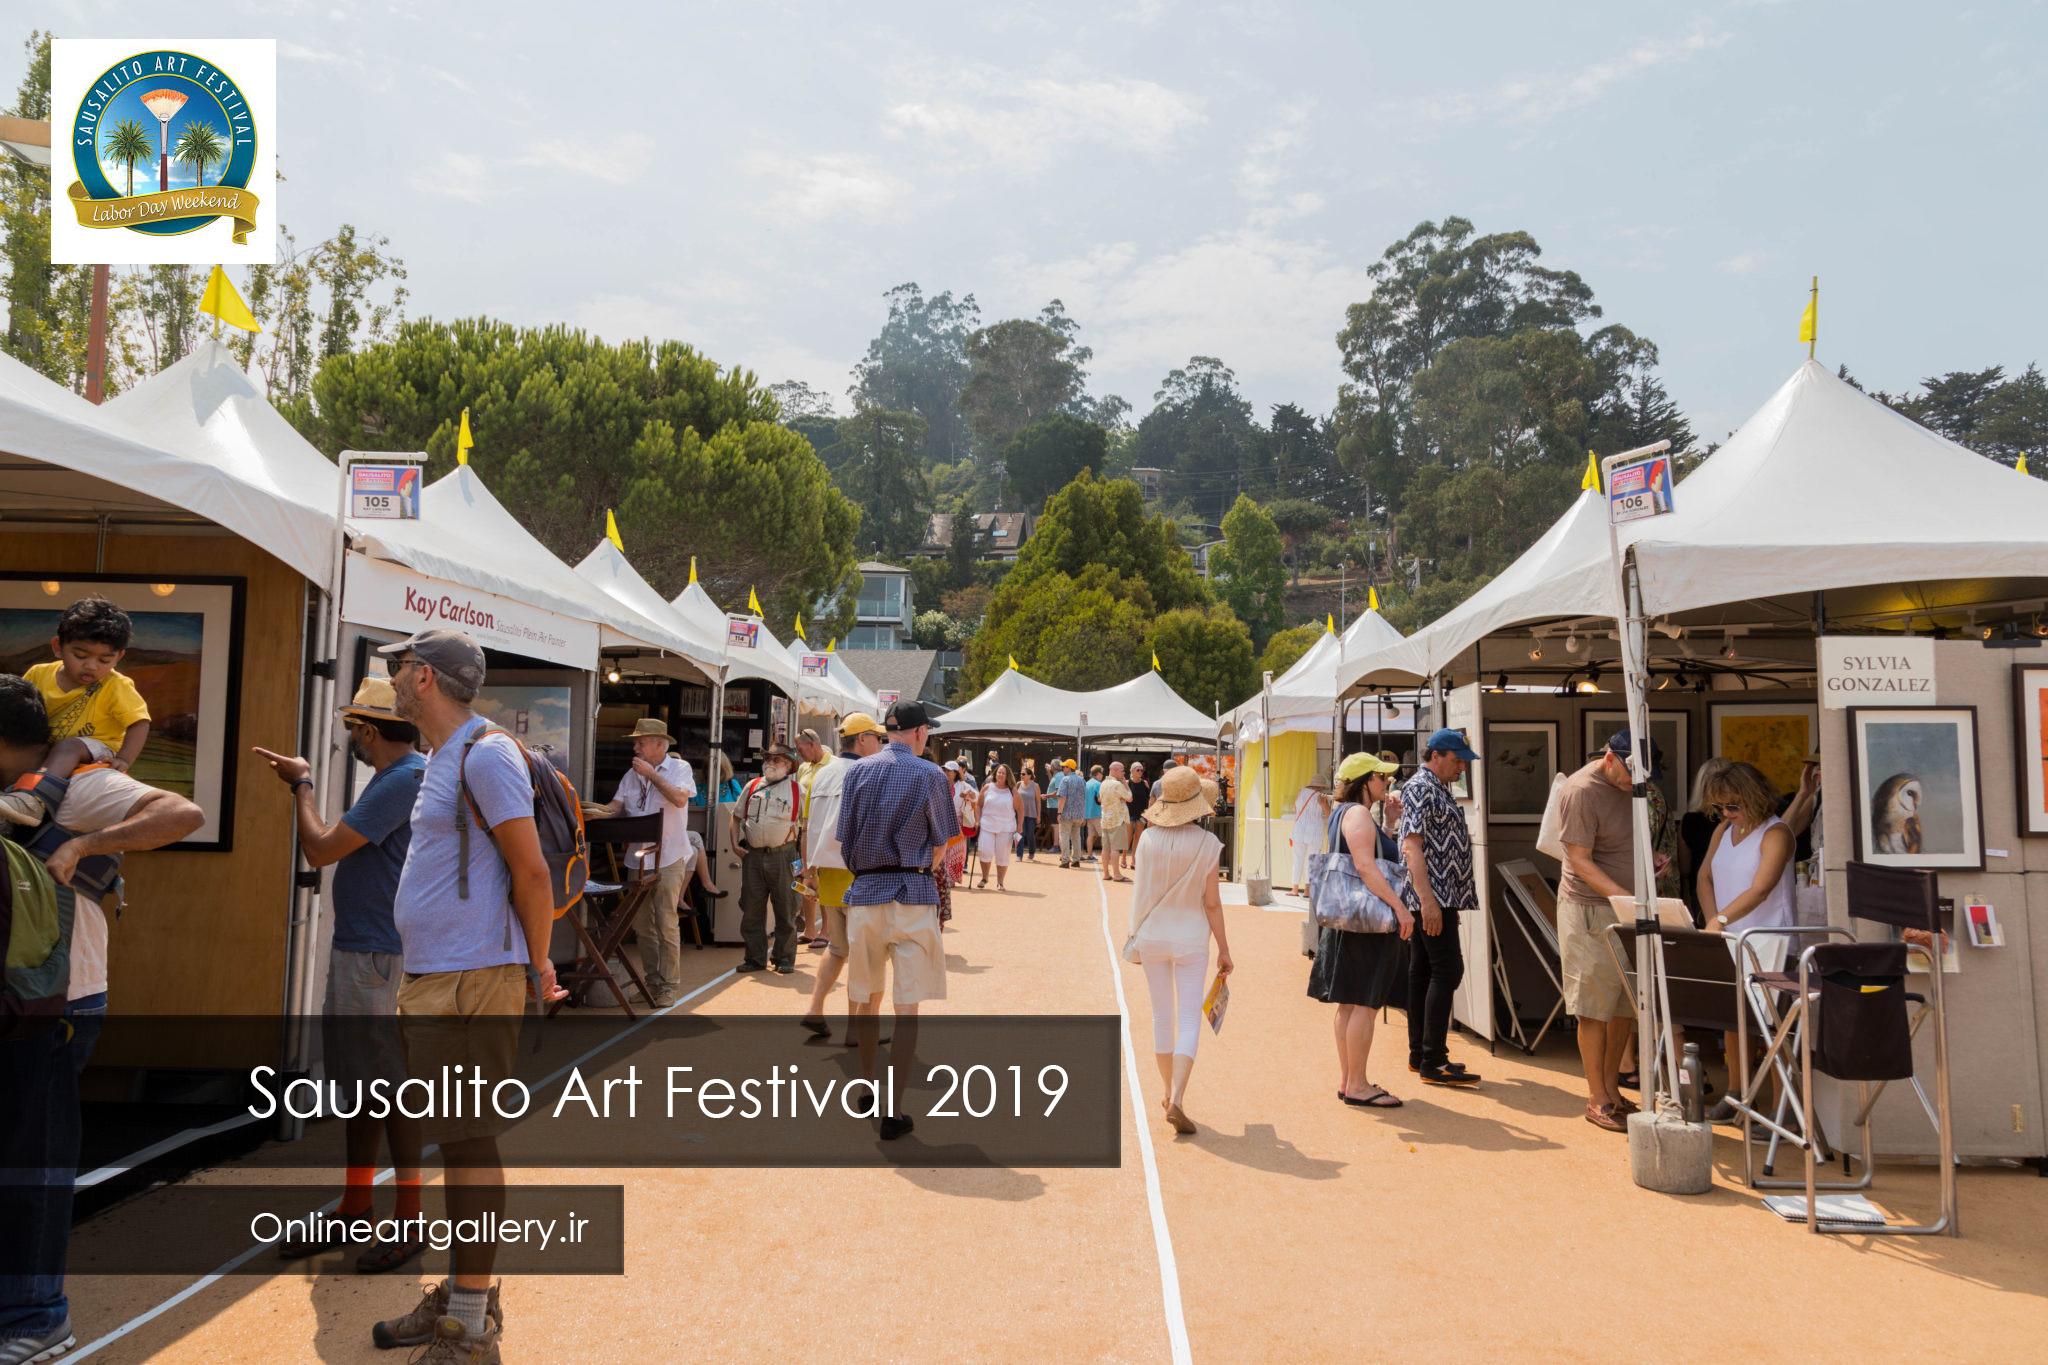 فراخوان Sausalito Art Festival